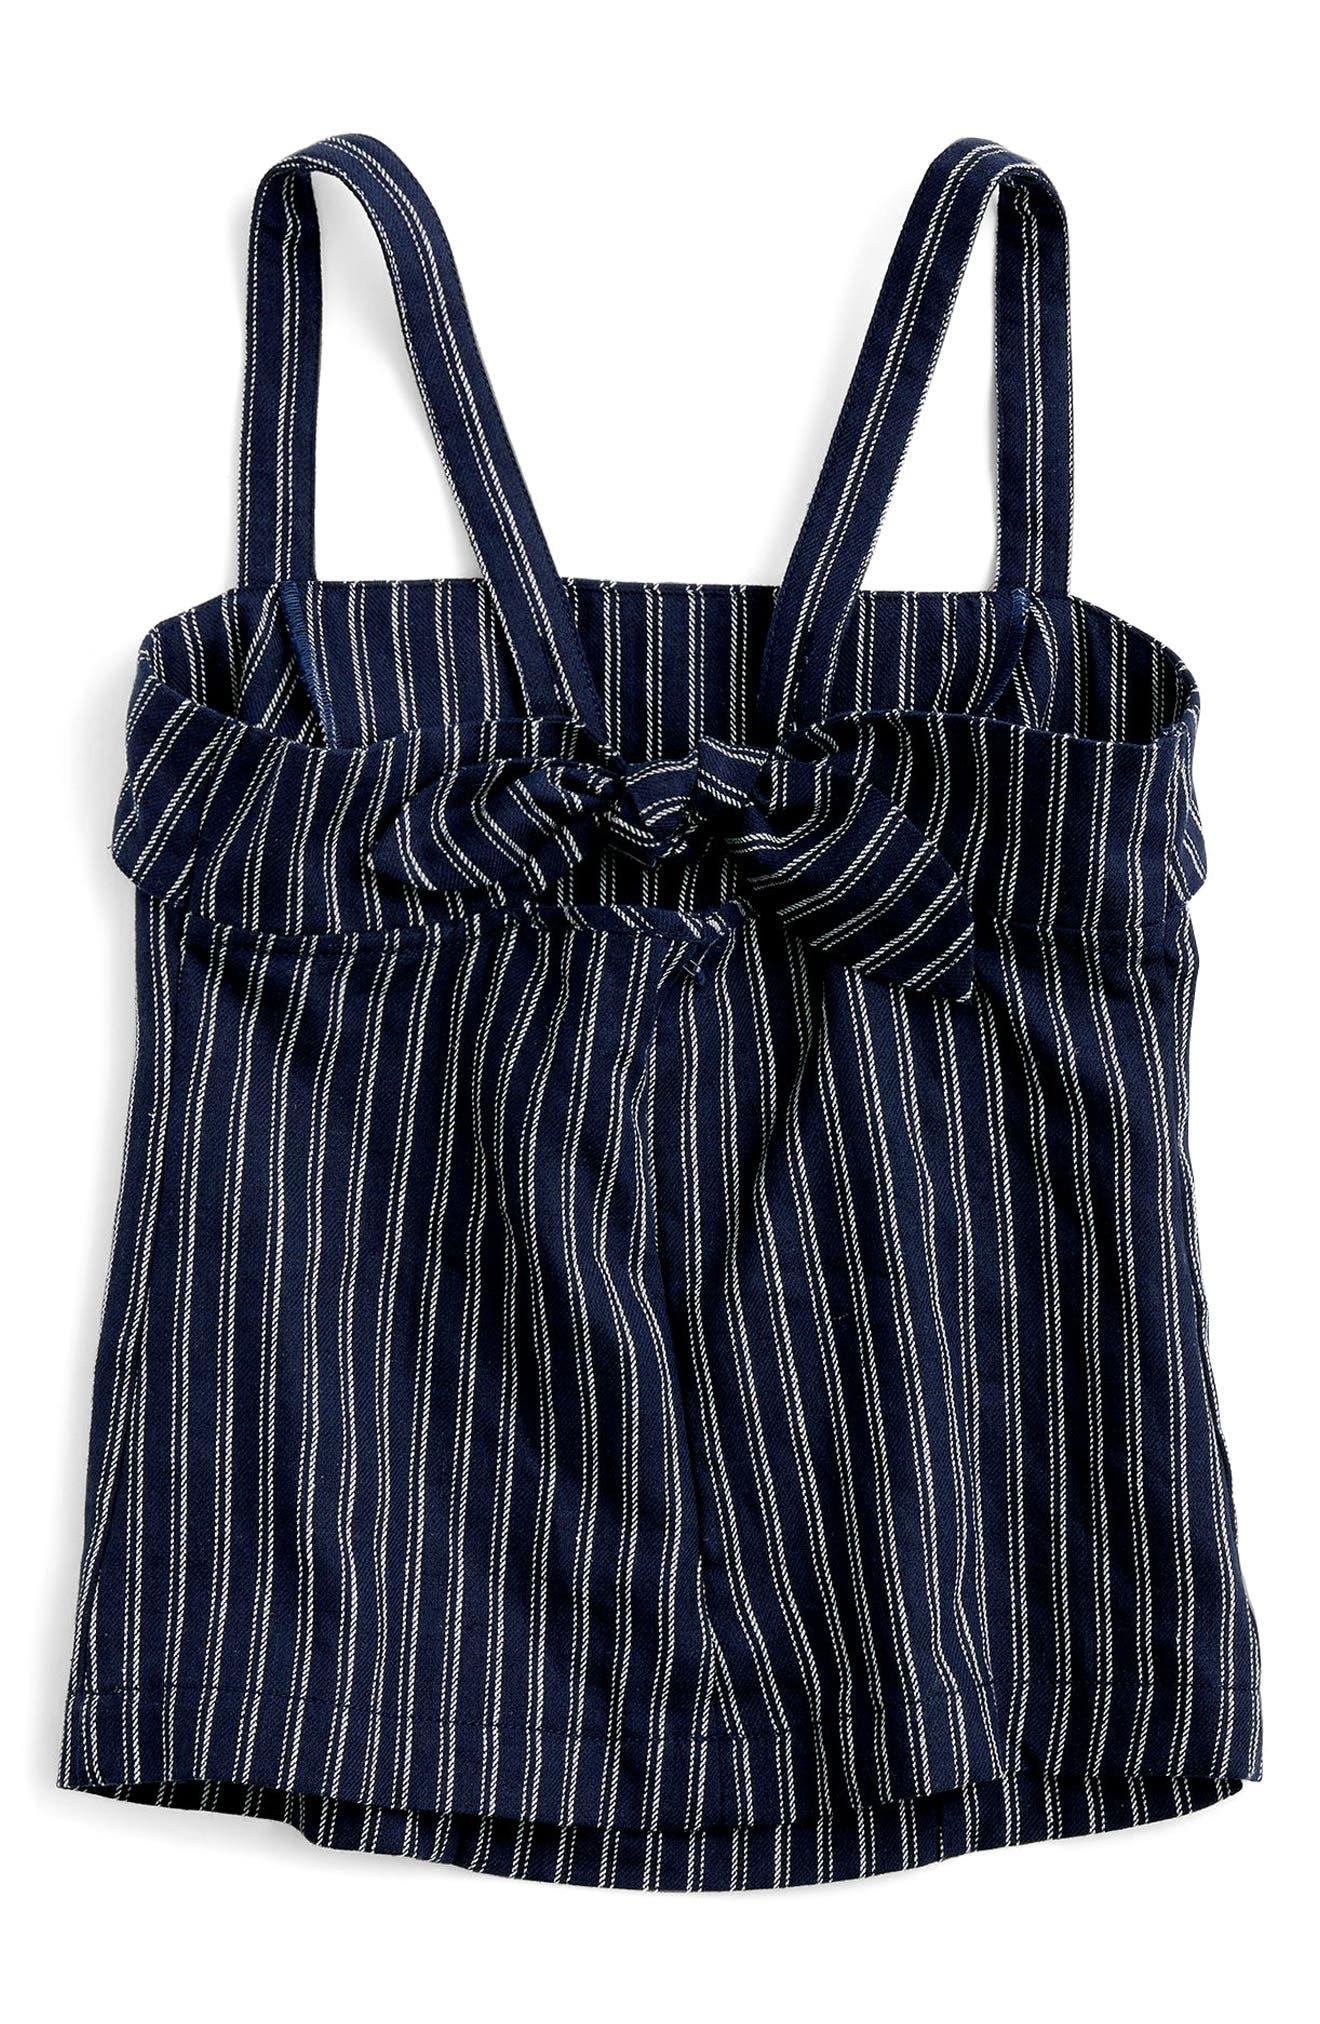 J.CREW,                             Turnover Stripe Linen & Cotton Top,                             Alternate thumbnail 3, color,                             400